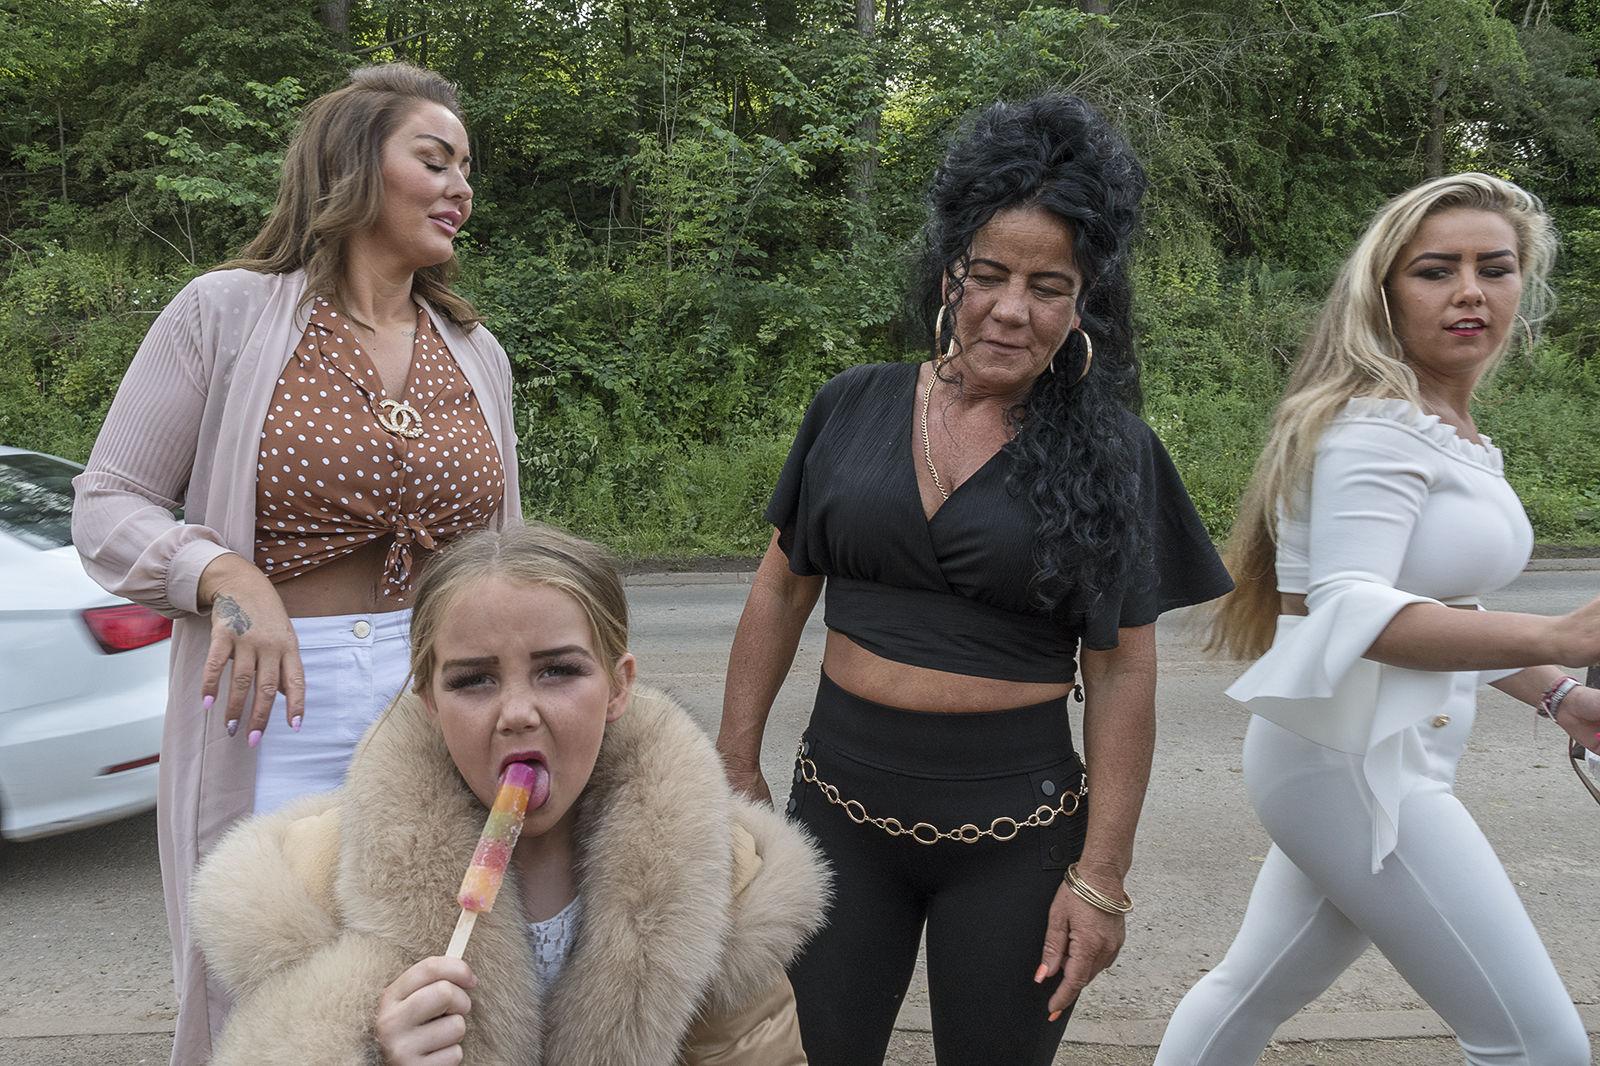 Ice Pop, Appleby-in-Westmoreland, UK 2019